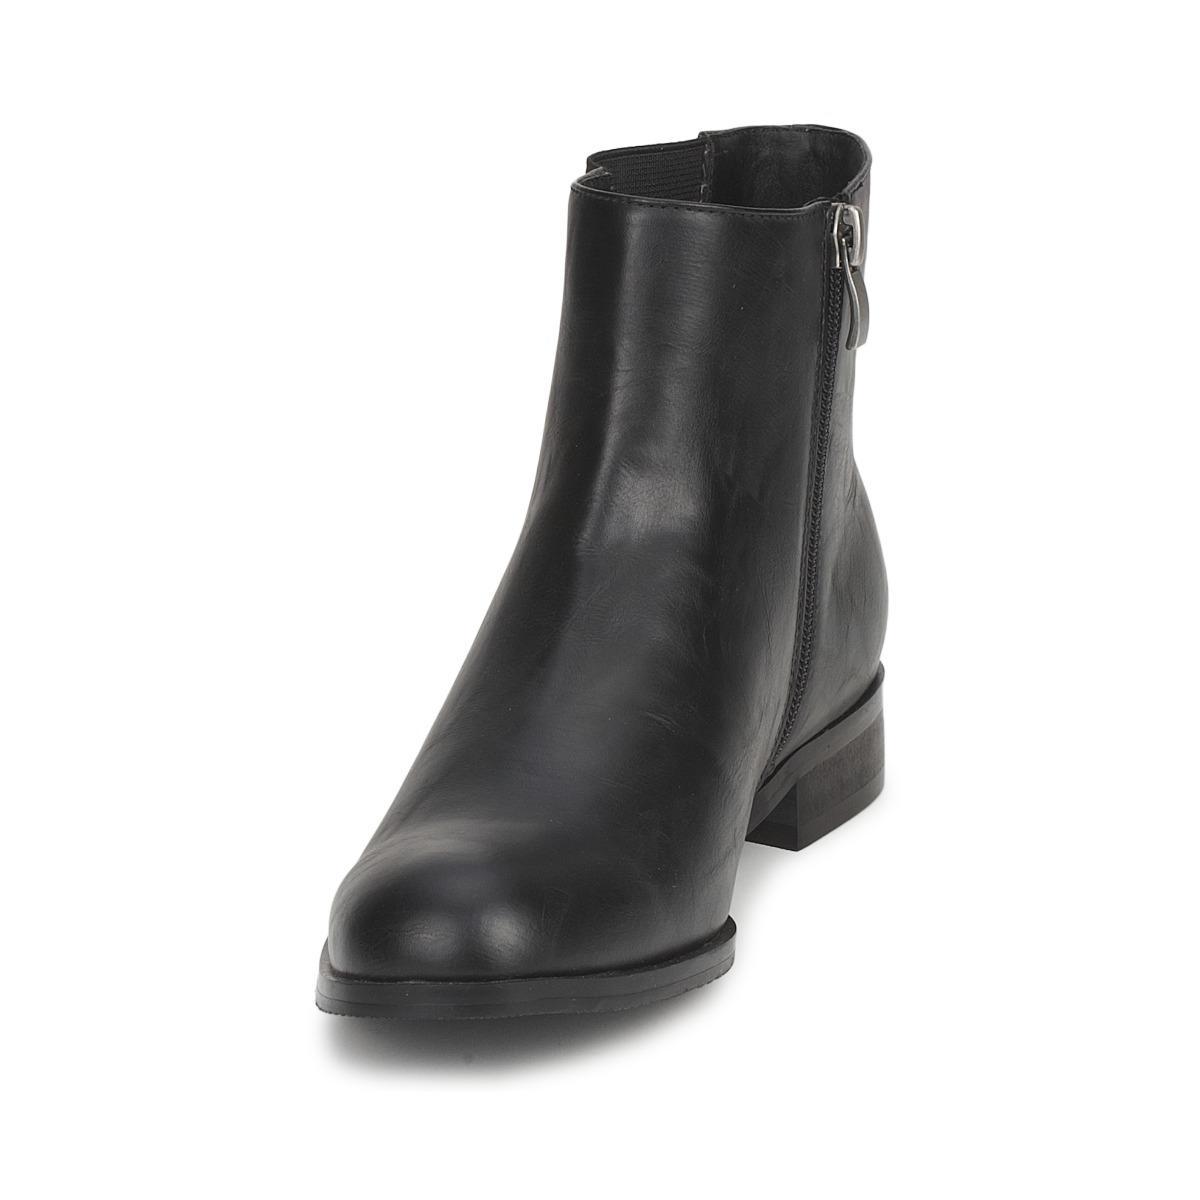 Moony Mood Synthetic Yenek Mid Boots in Black